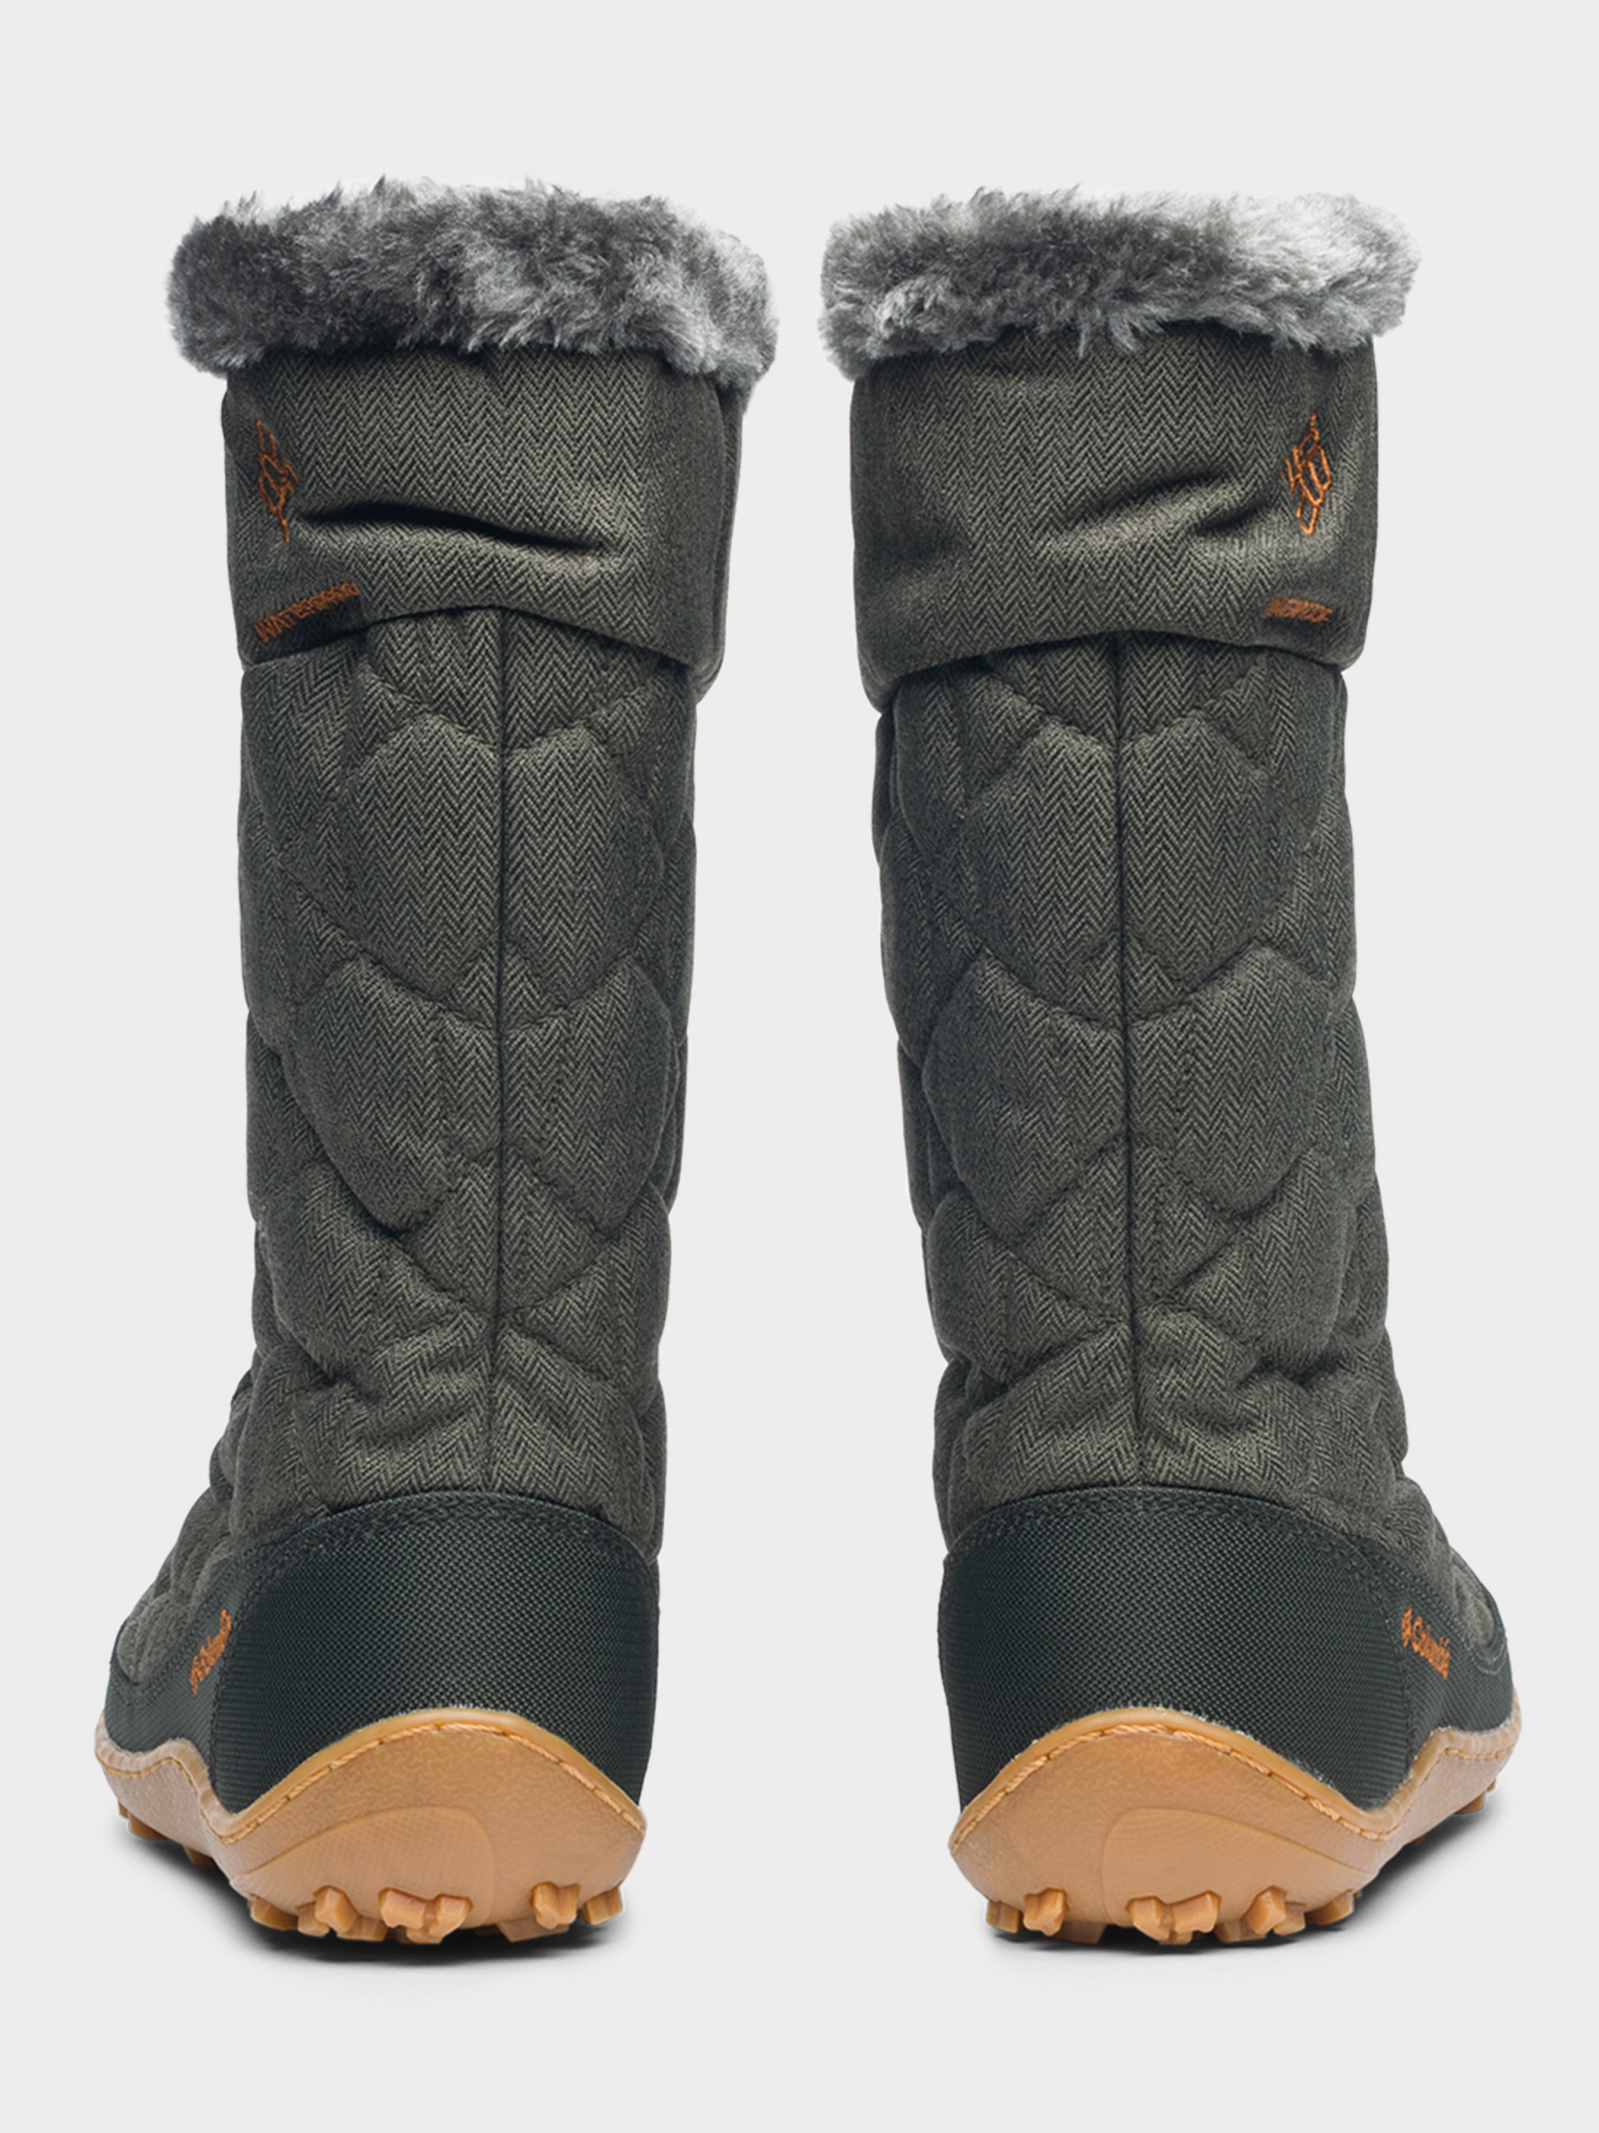 Сапоги женские Сапоги Columbia Minx Mid II Omni-Heat BL2757-383 BL2757-383 модные, 2017